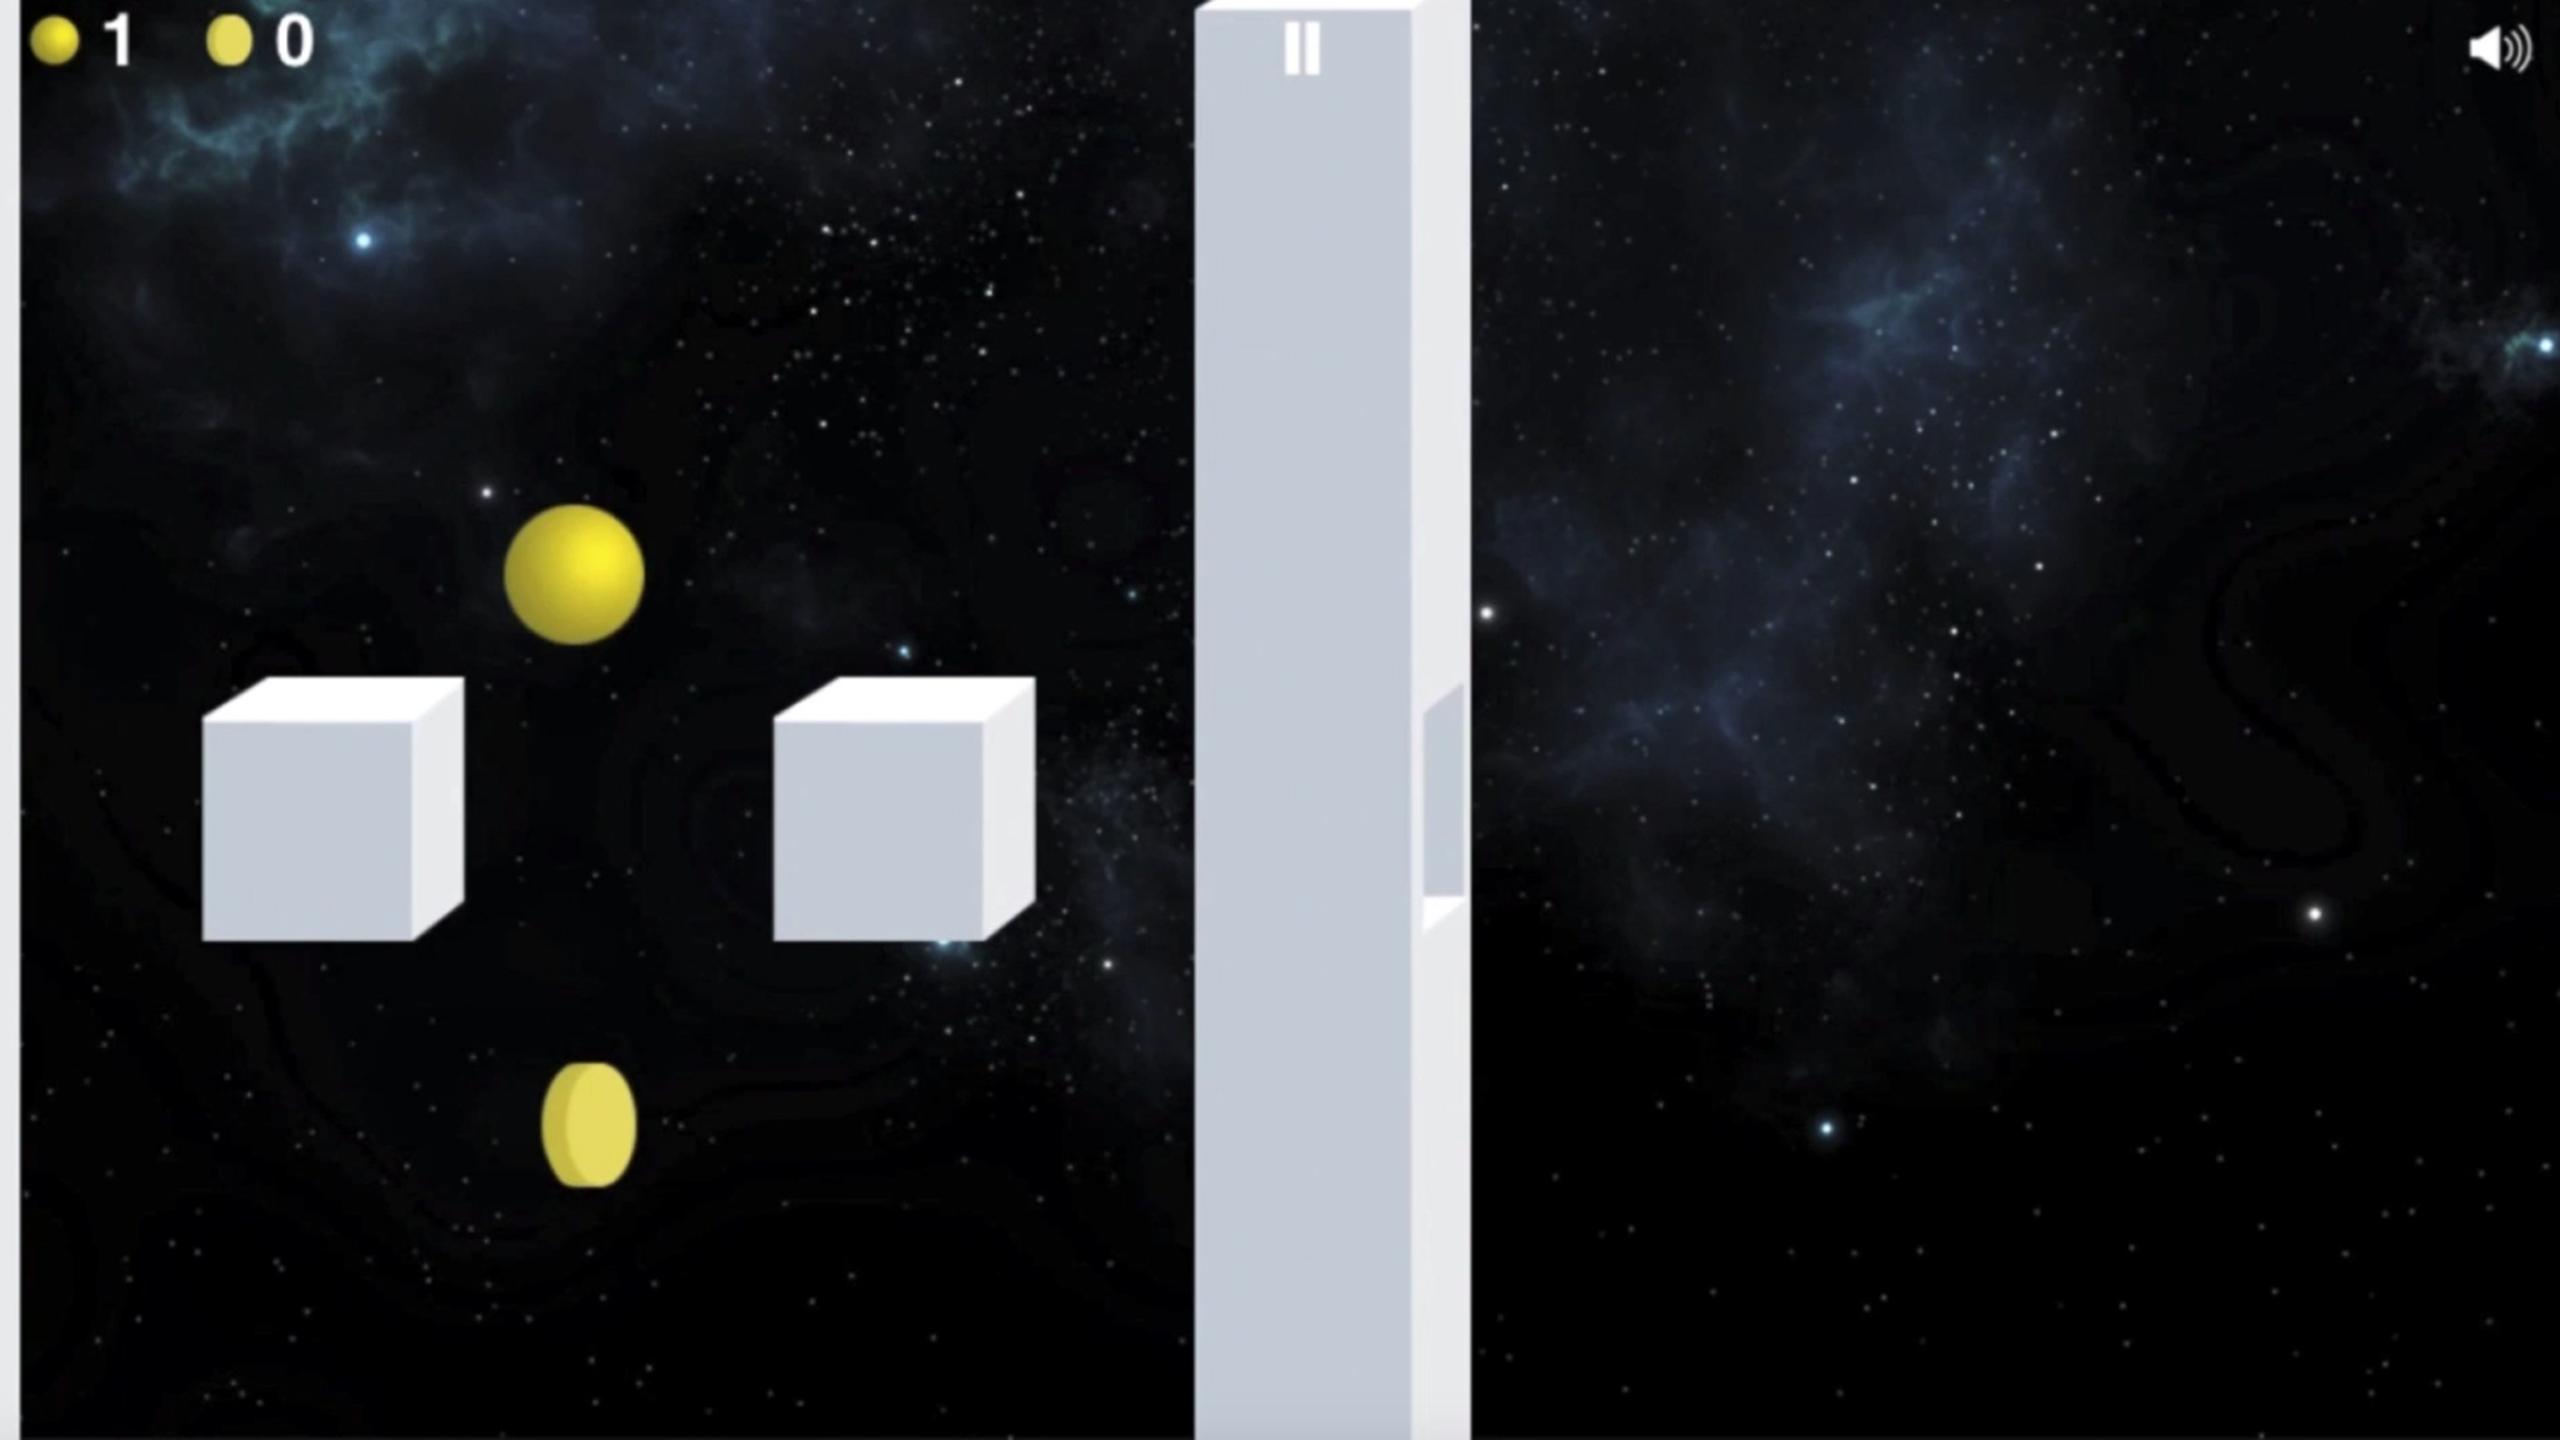 Hole in the Wall Screenshot 1